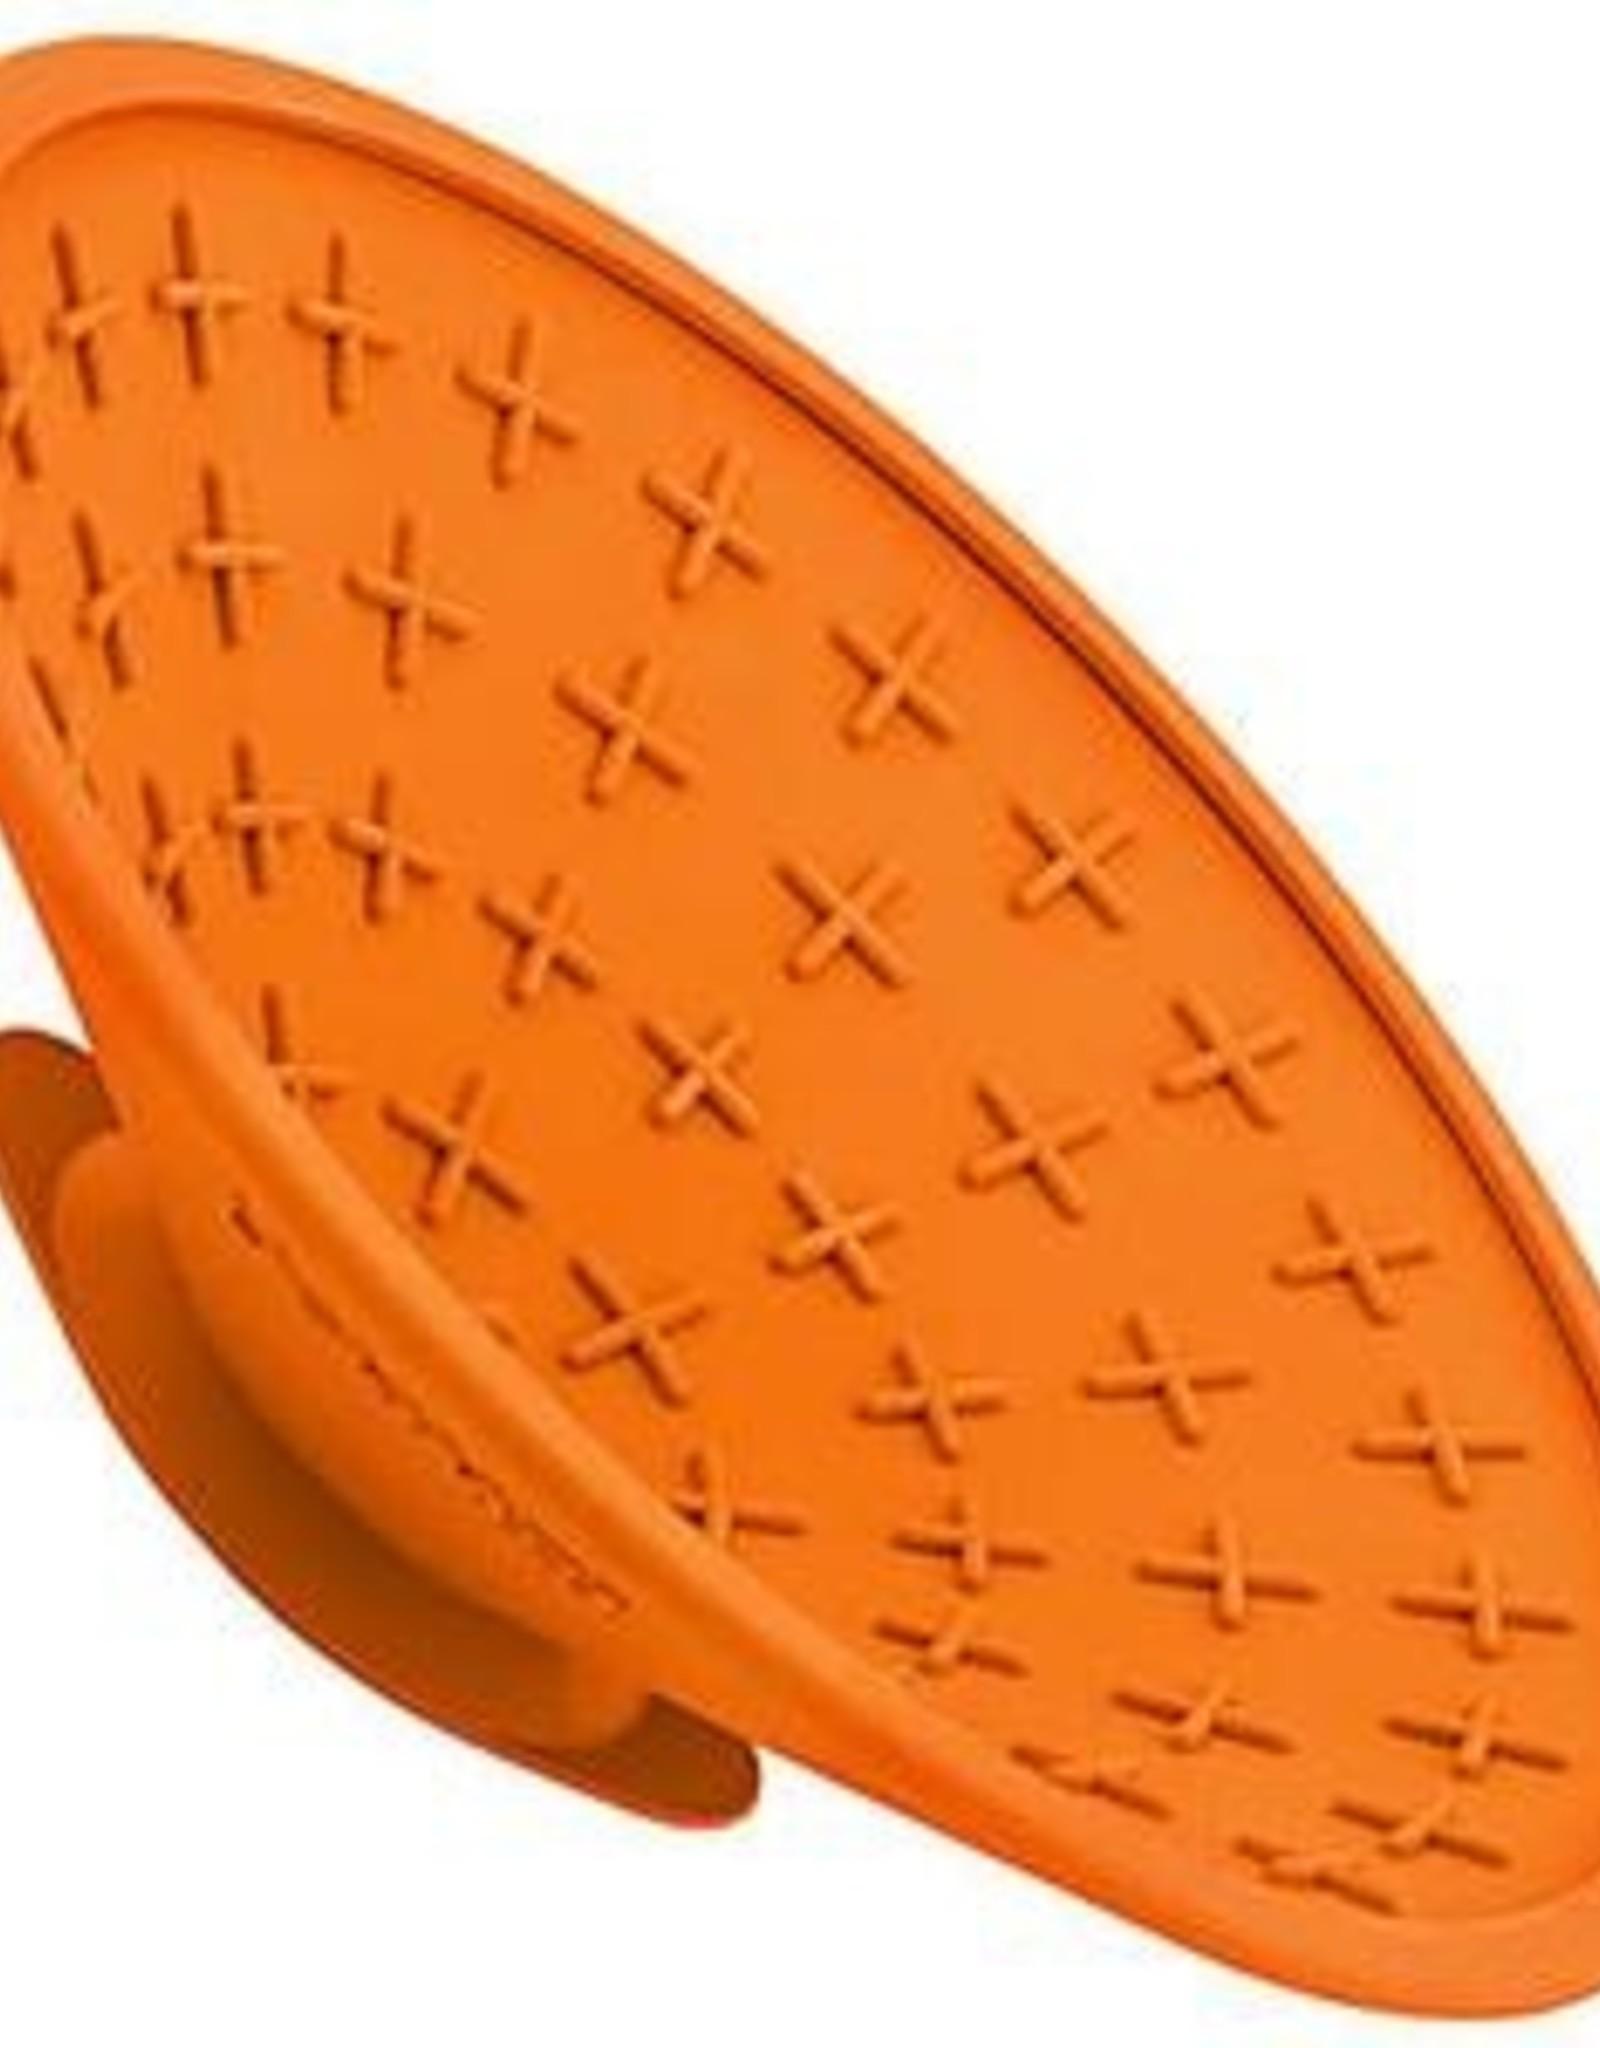 Hyper Pet Lickimat Splash Treat Mat with Suction